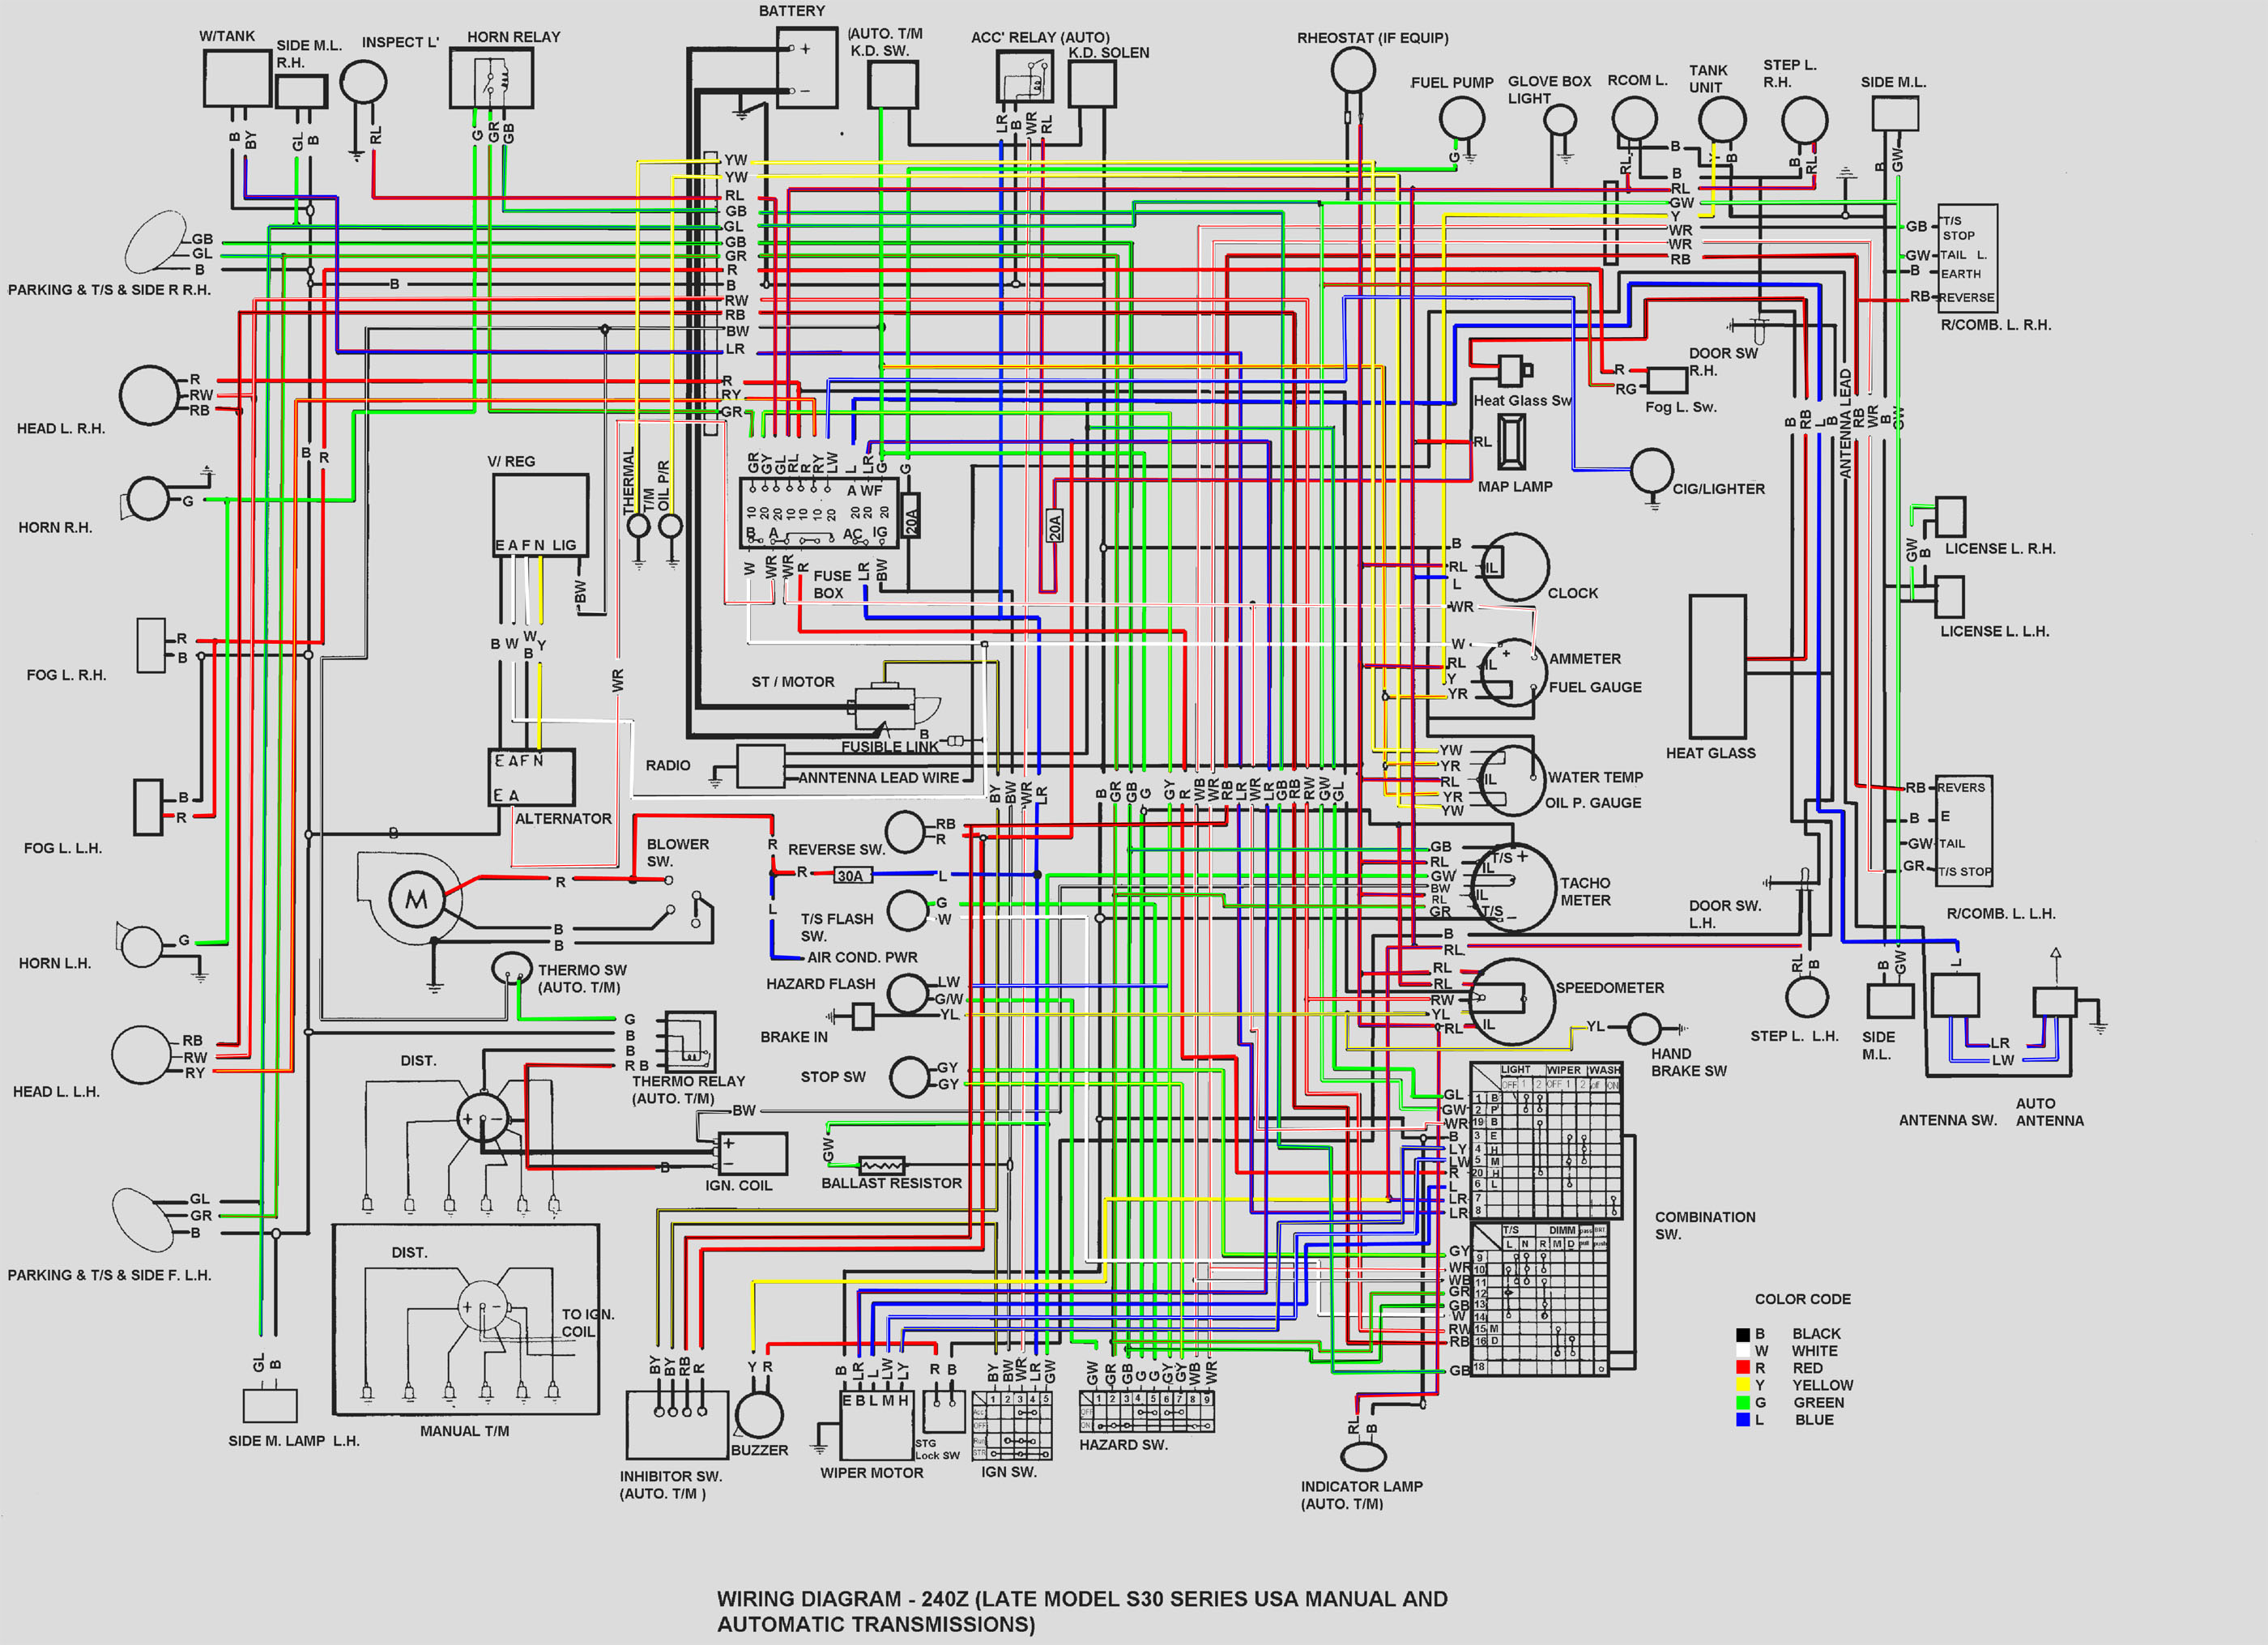 Phenomenal 1978 Datsun 280Z Wiring Diagram Online Wiring Diagram Wiring Cloud Loplapiotaidewilluminateatxorg